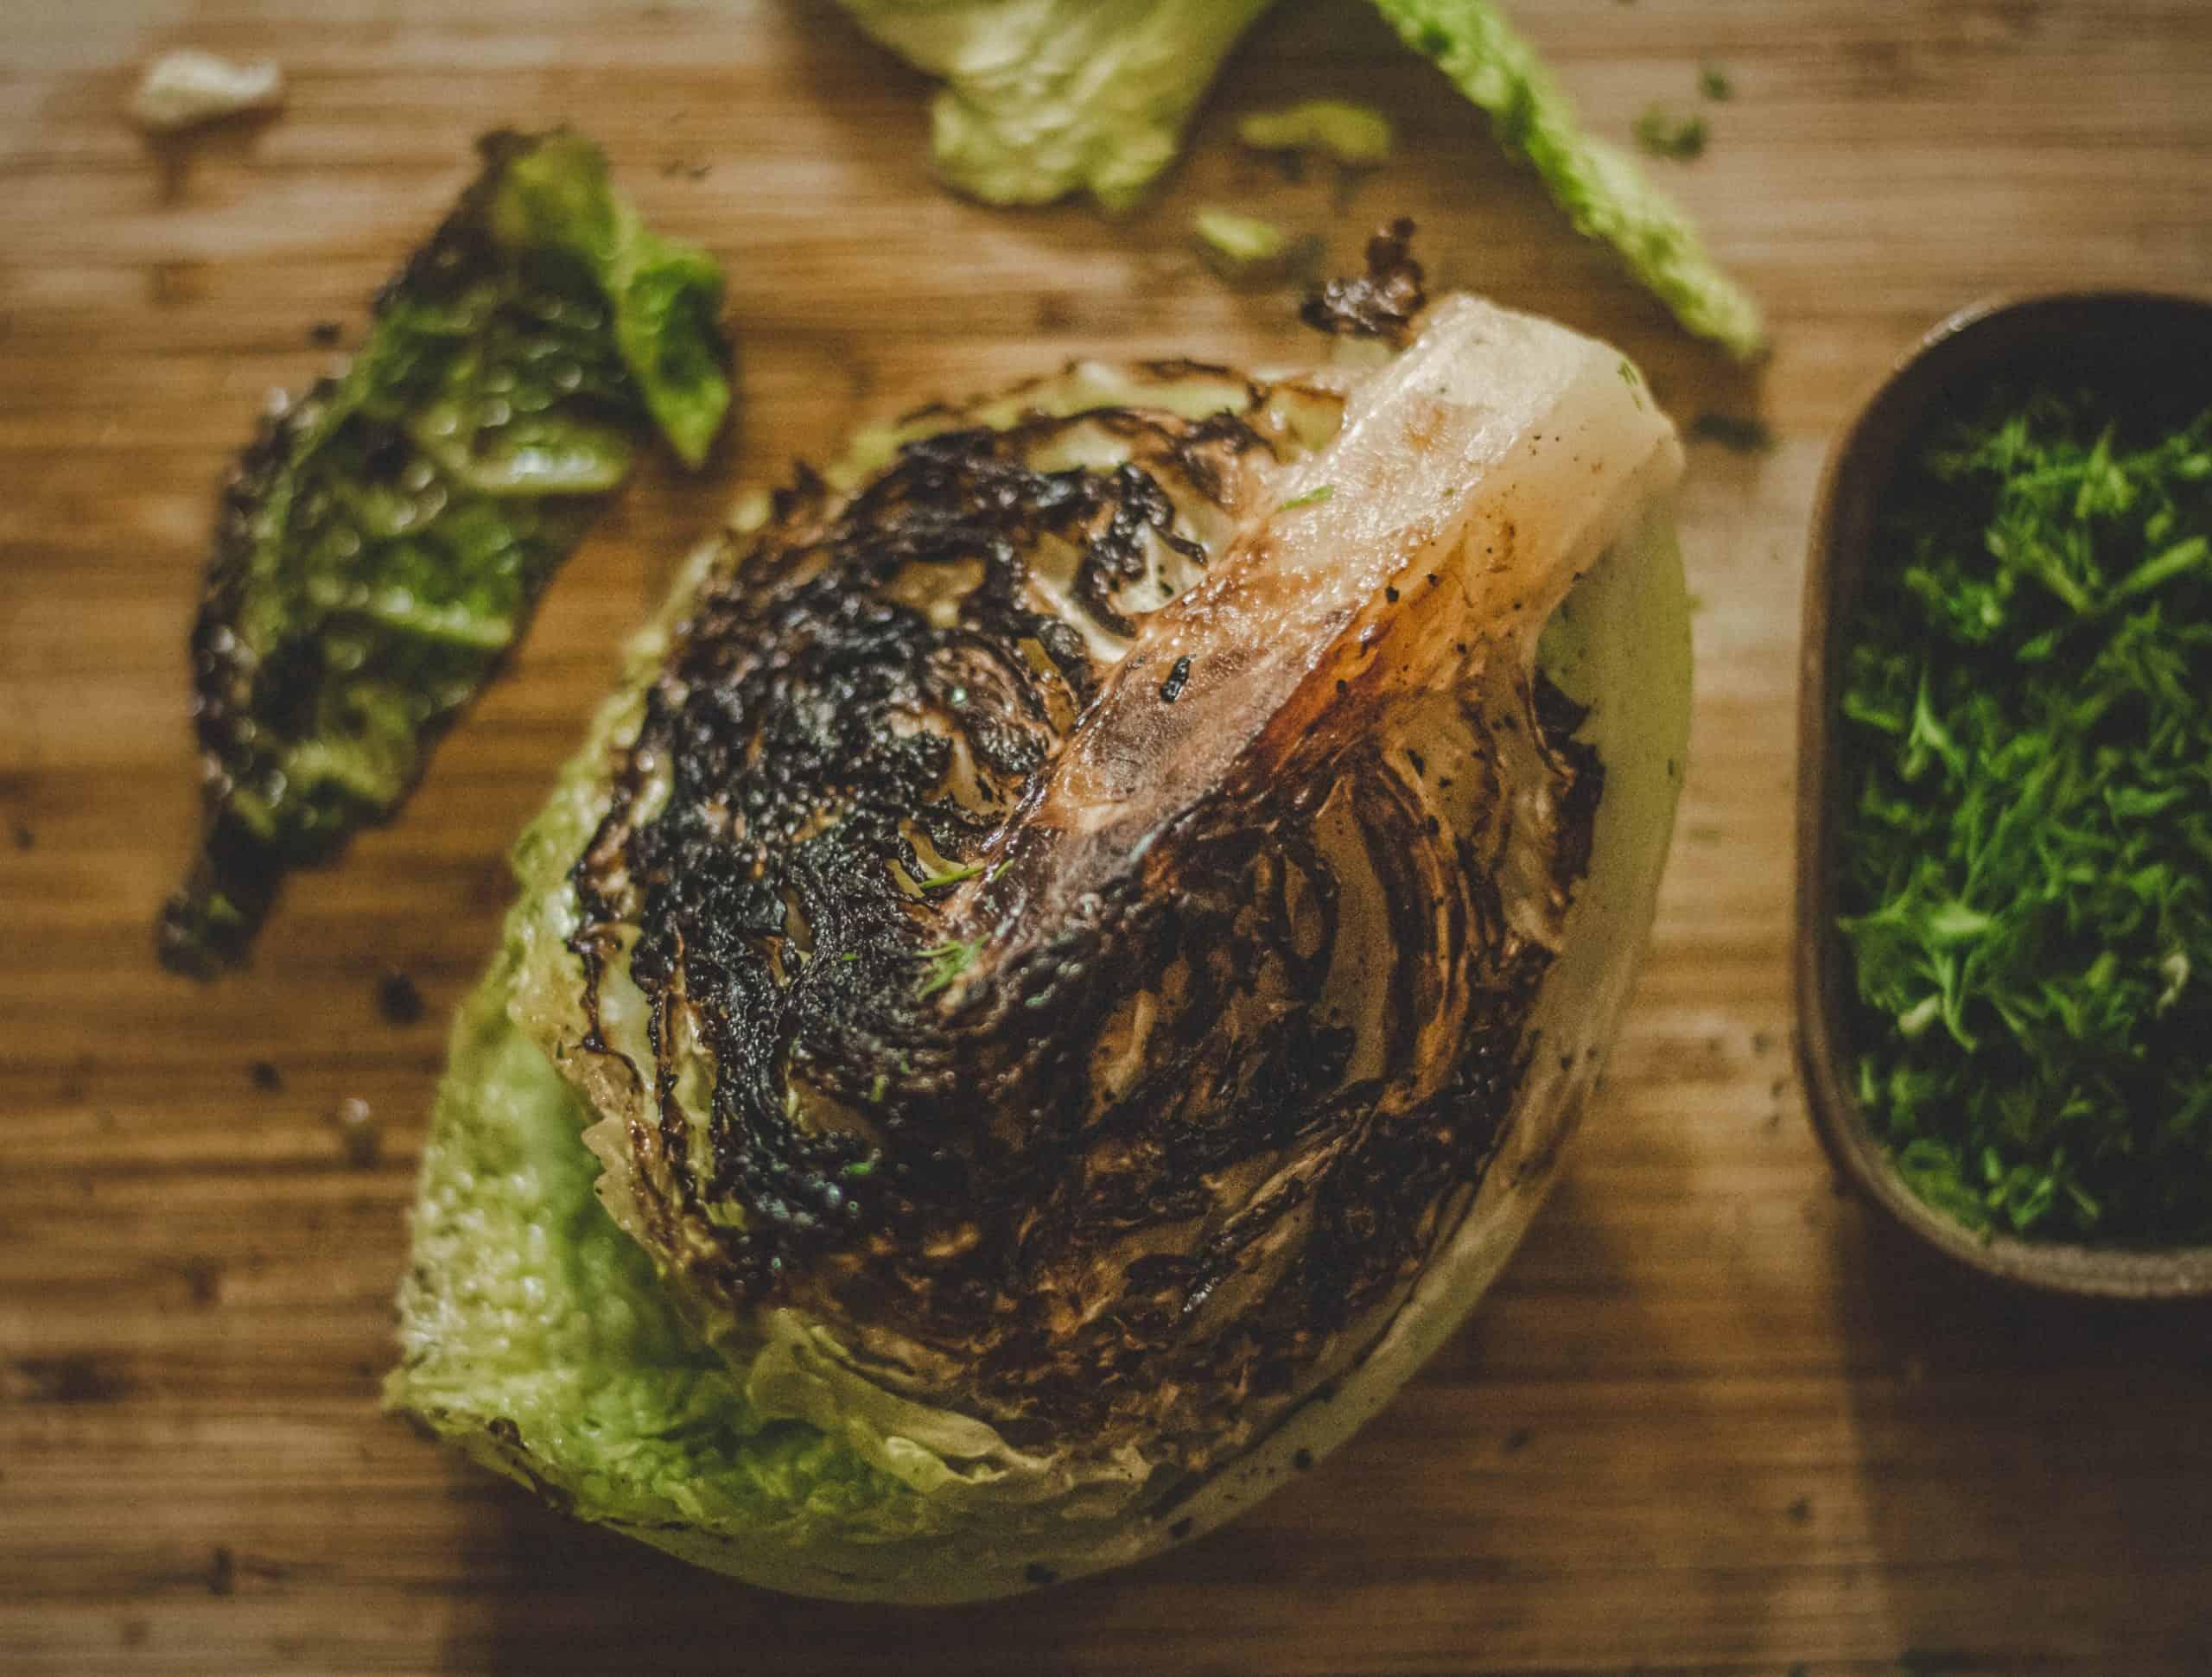 BBQ Hispi Cabbage recipe Photo by Rachel Clark Unsplash